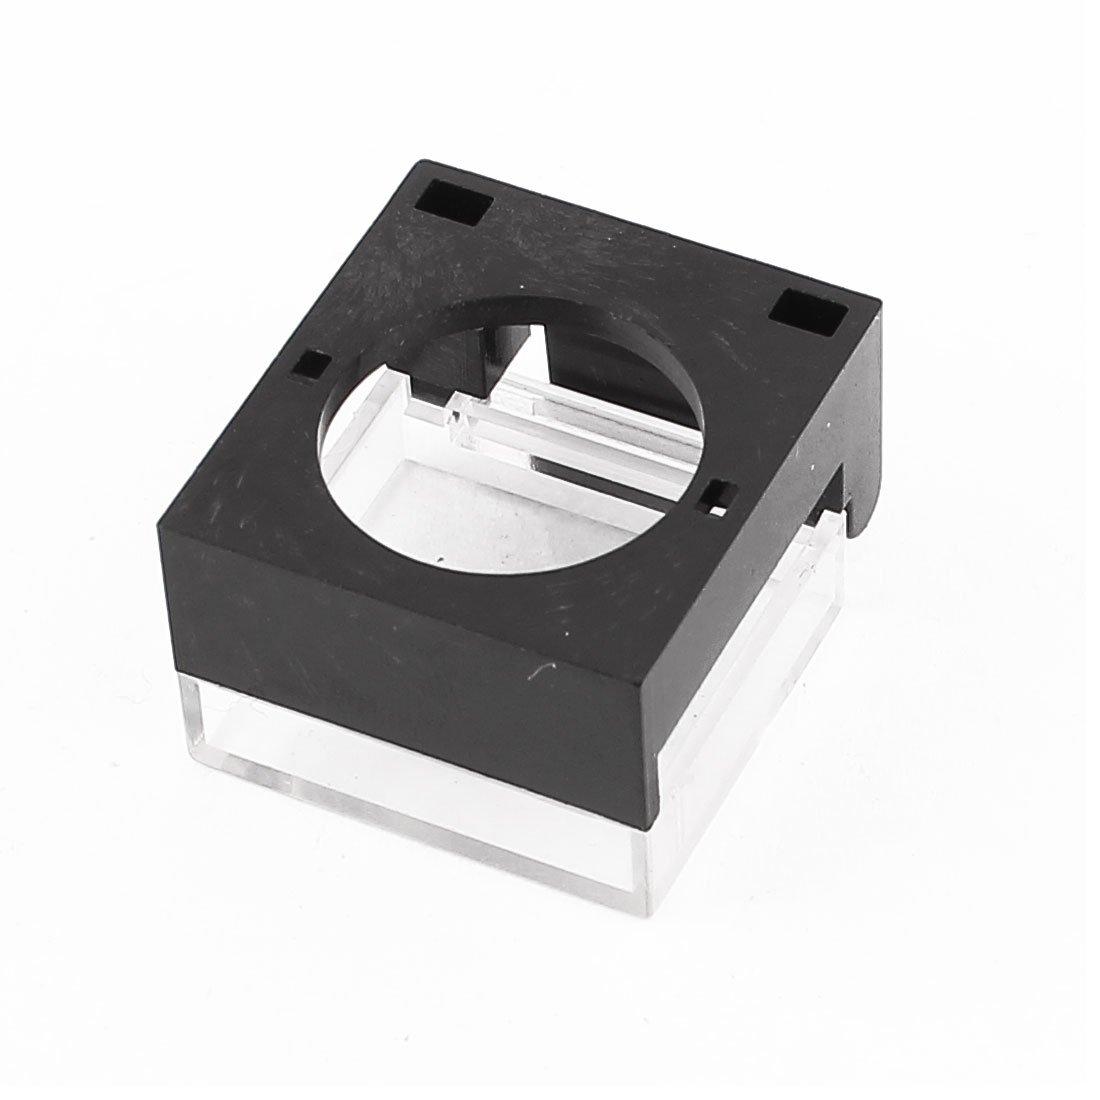 100 SMD Widerstand 68Ohm MCR18 0,25W 68R chip resistor 1206 5/% 013213